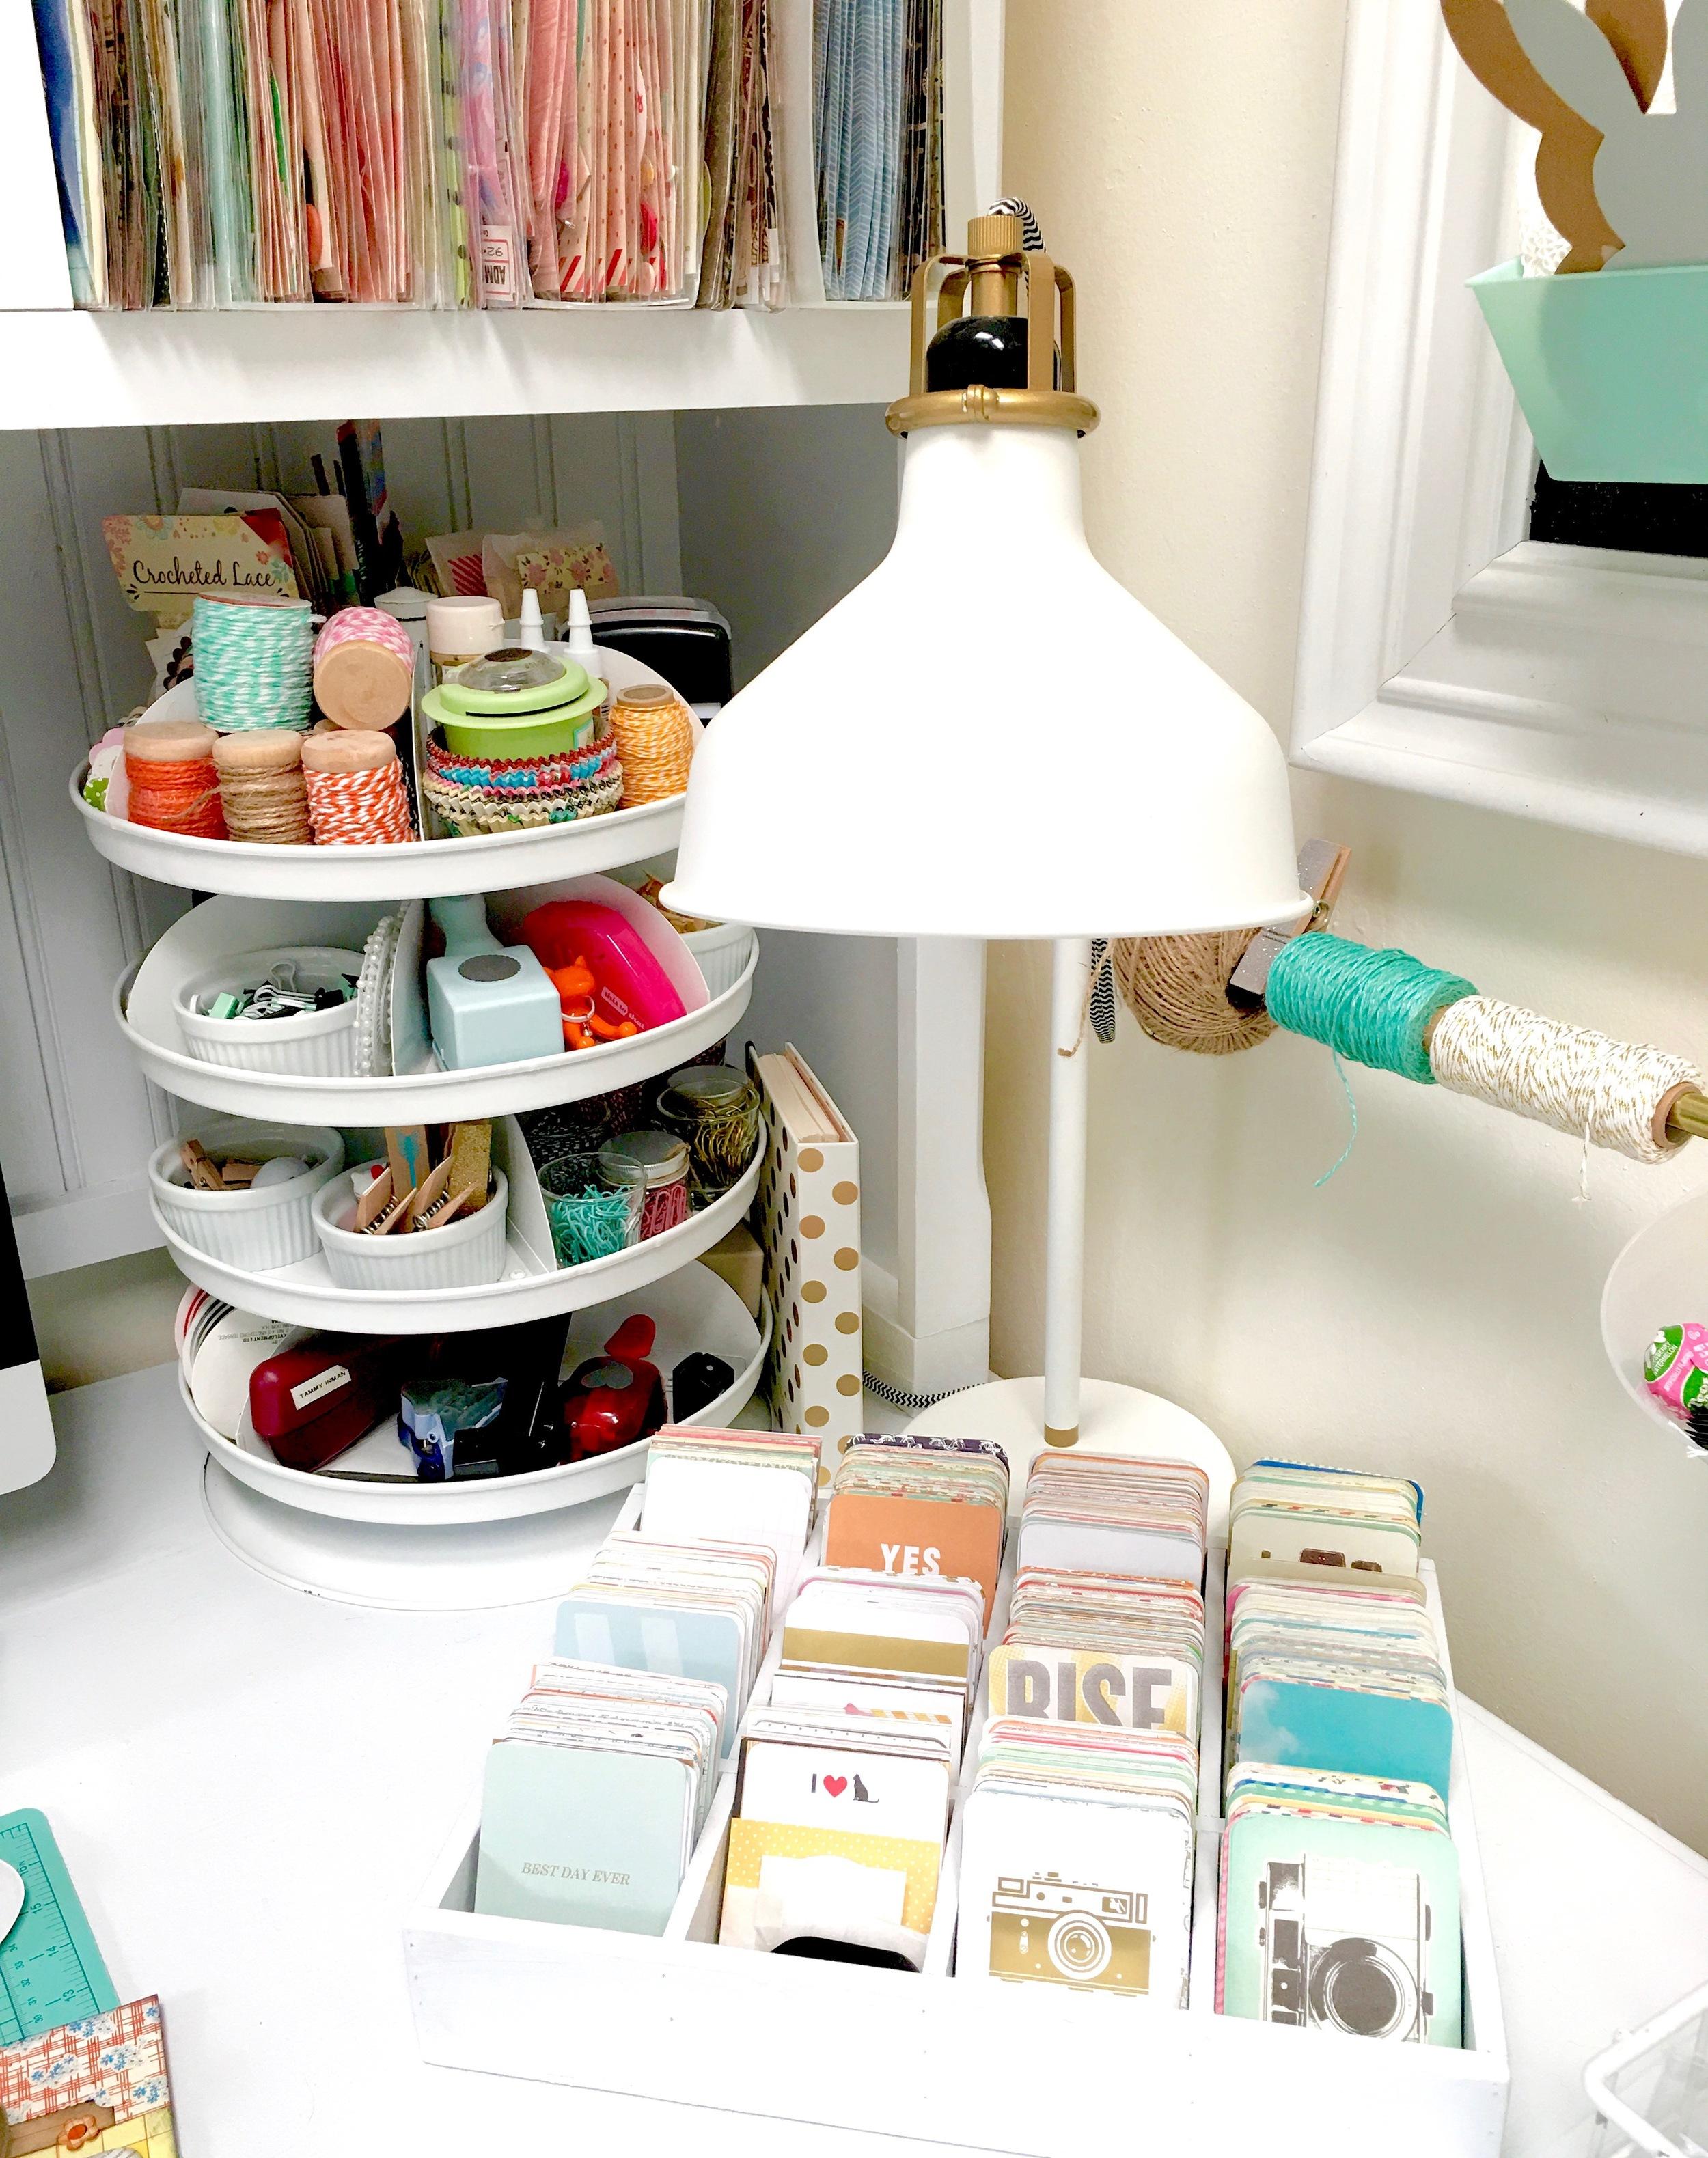 scrap-desk-craft-supplies-scrapbooking-embellishments-project-life-3x4-cards-a-peach-life